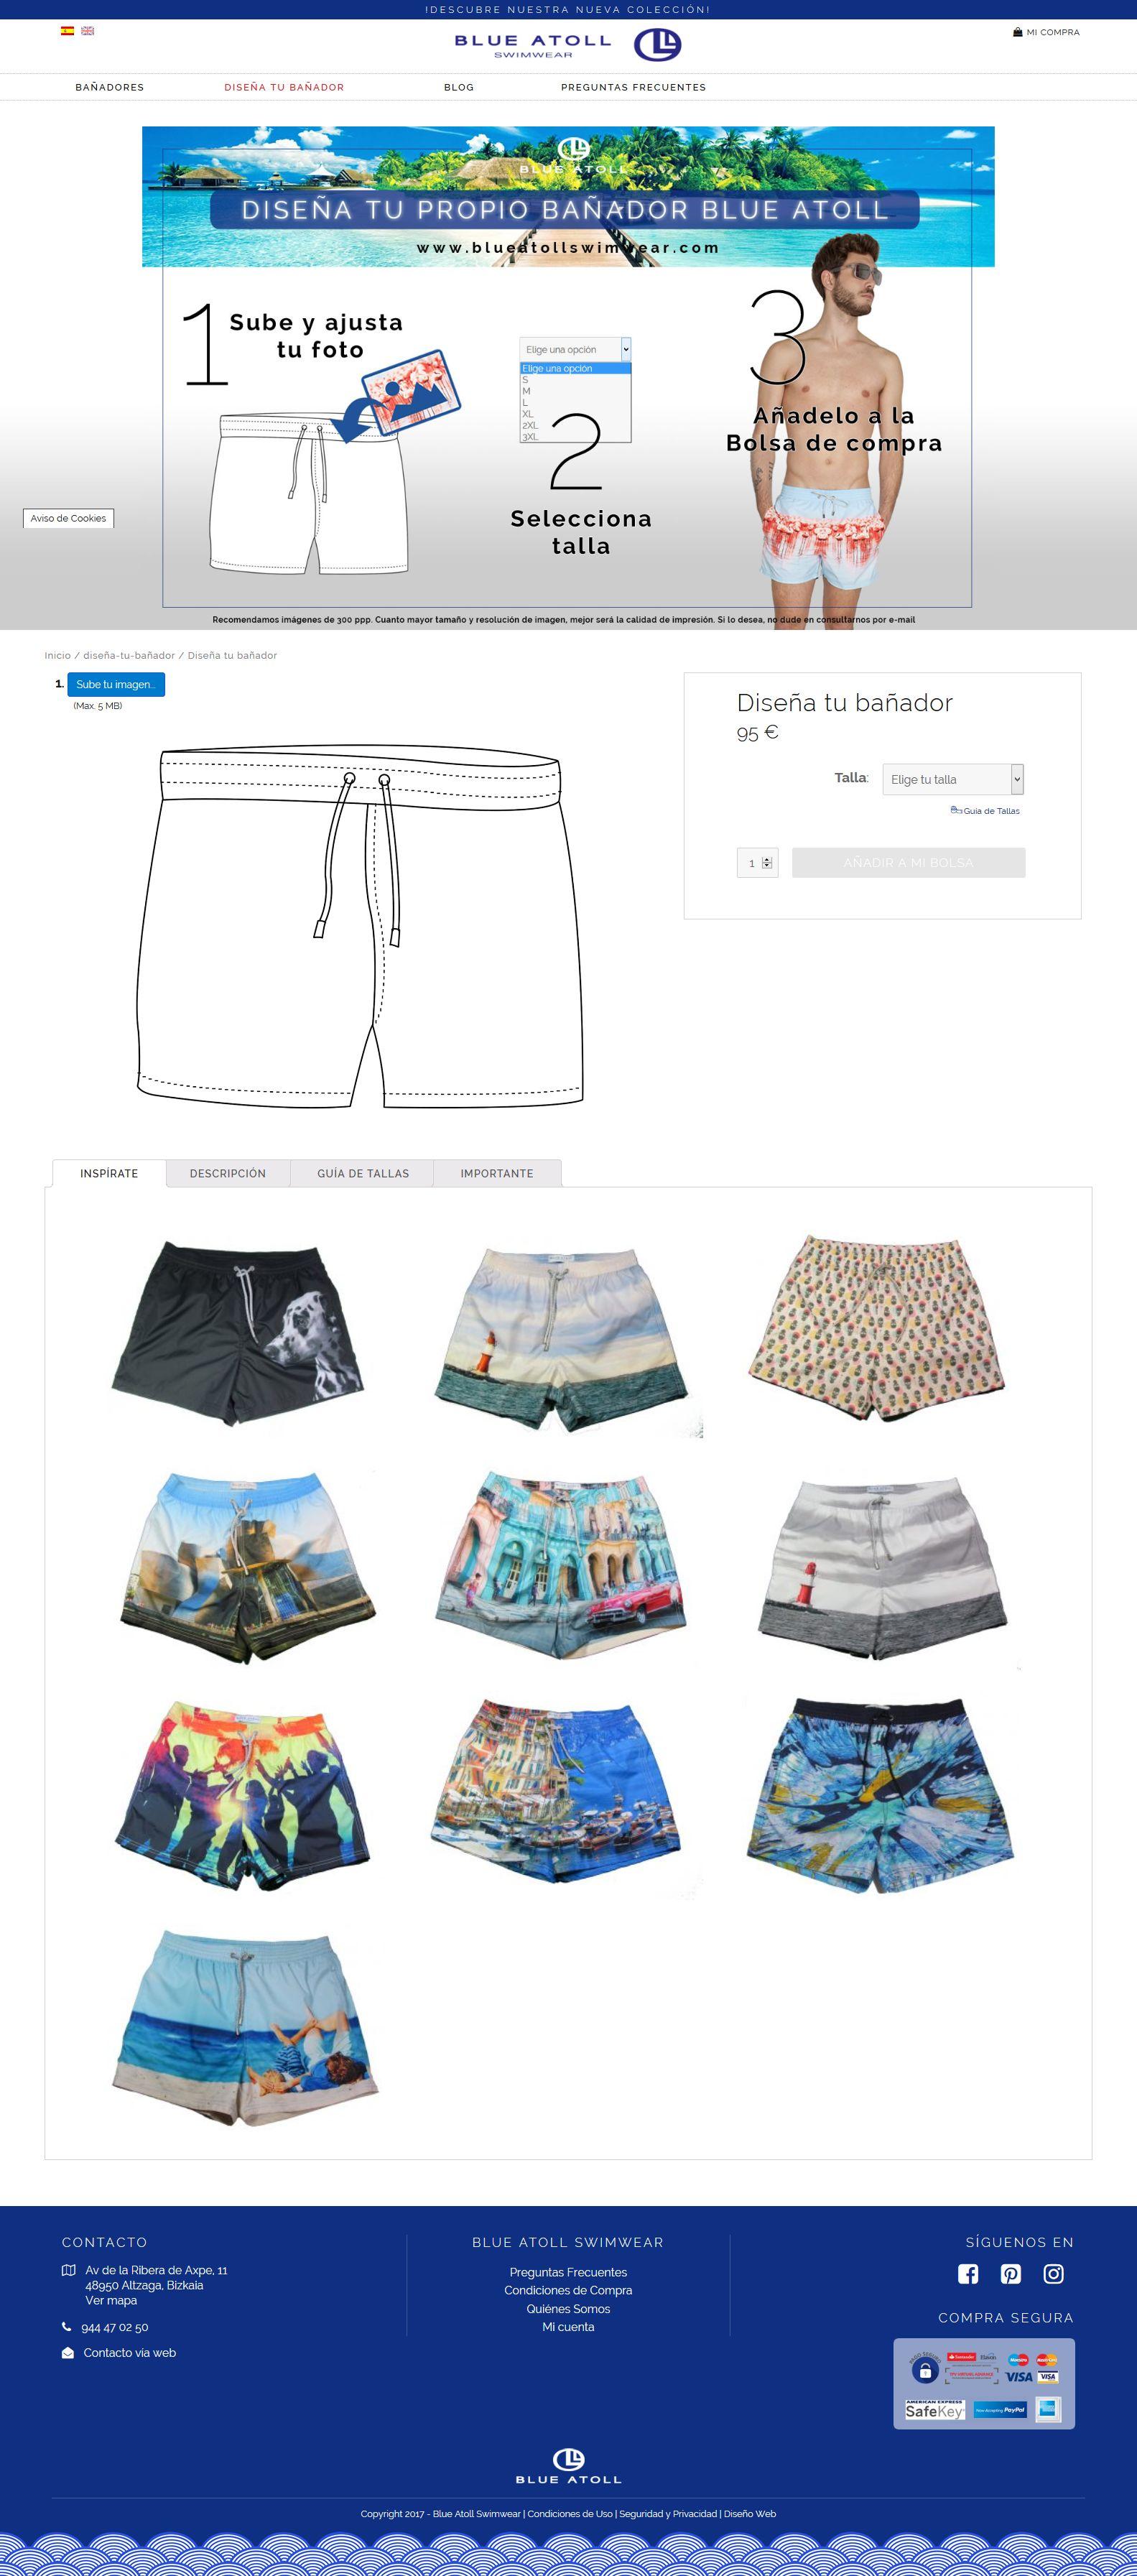 Blue atoll swimmwear tu ba ador online personalizado for Disena tu bano online